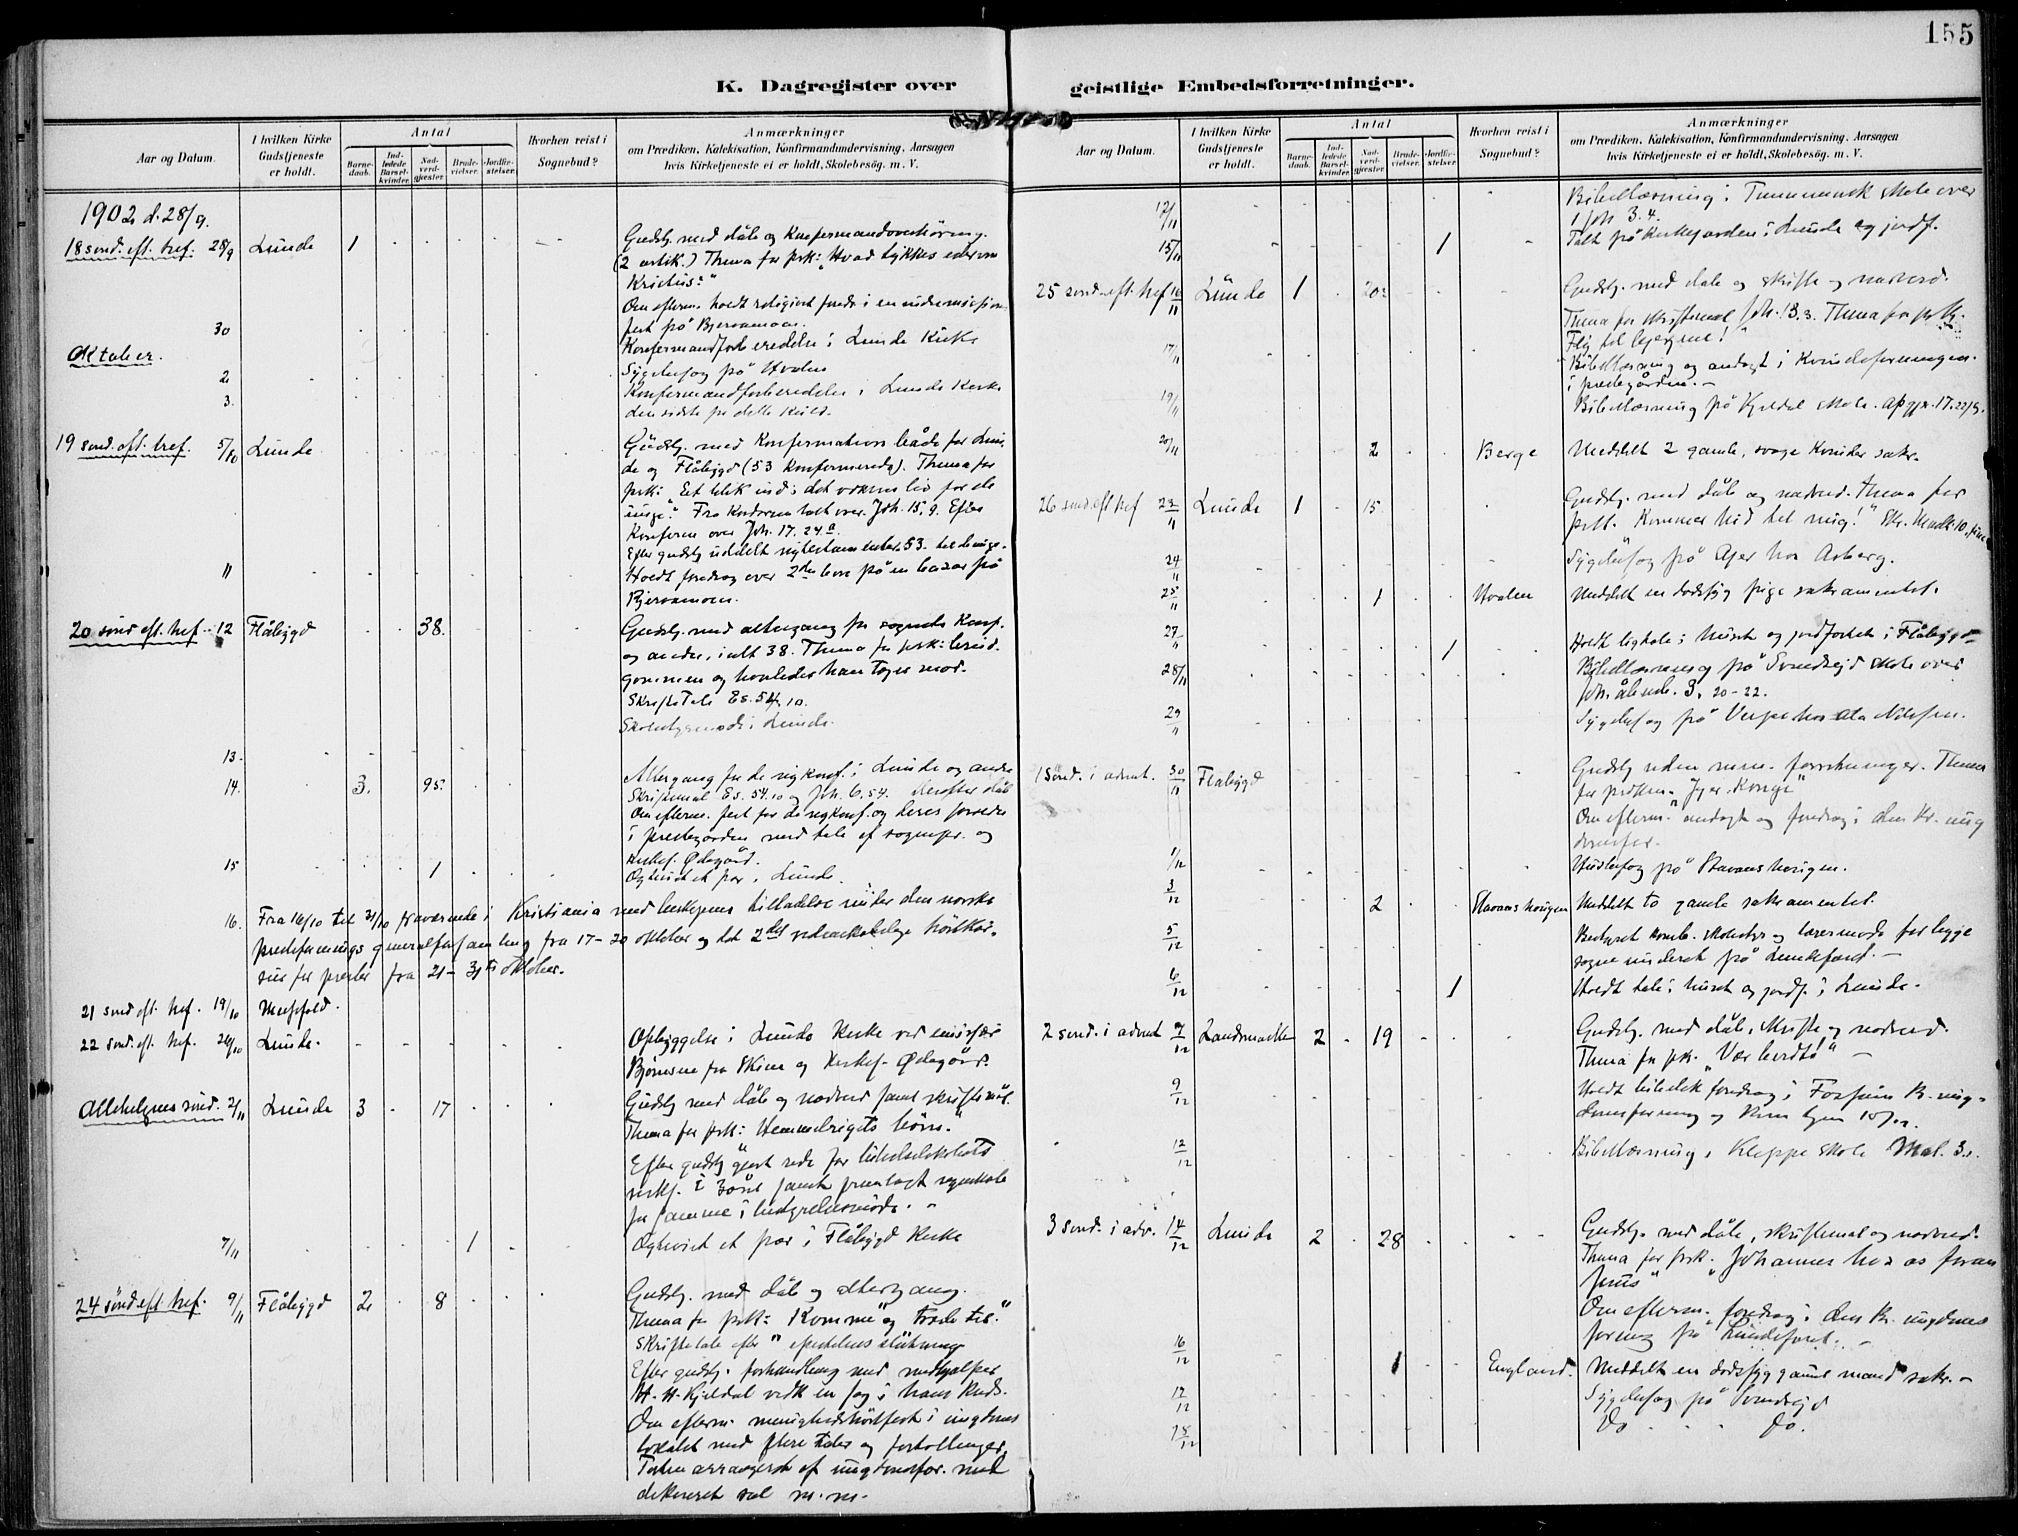 SAKO, Lunde kirkebøker, F/Fa/L0004: Ministerialbok nr. I 4, 1902-1913, s. 155